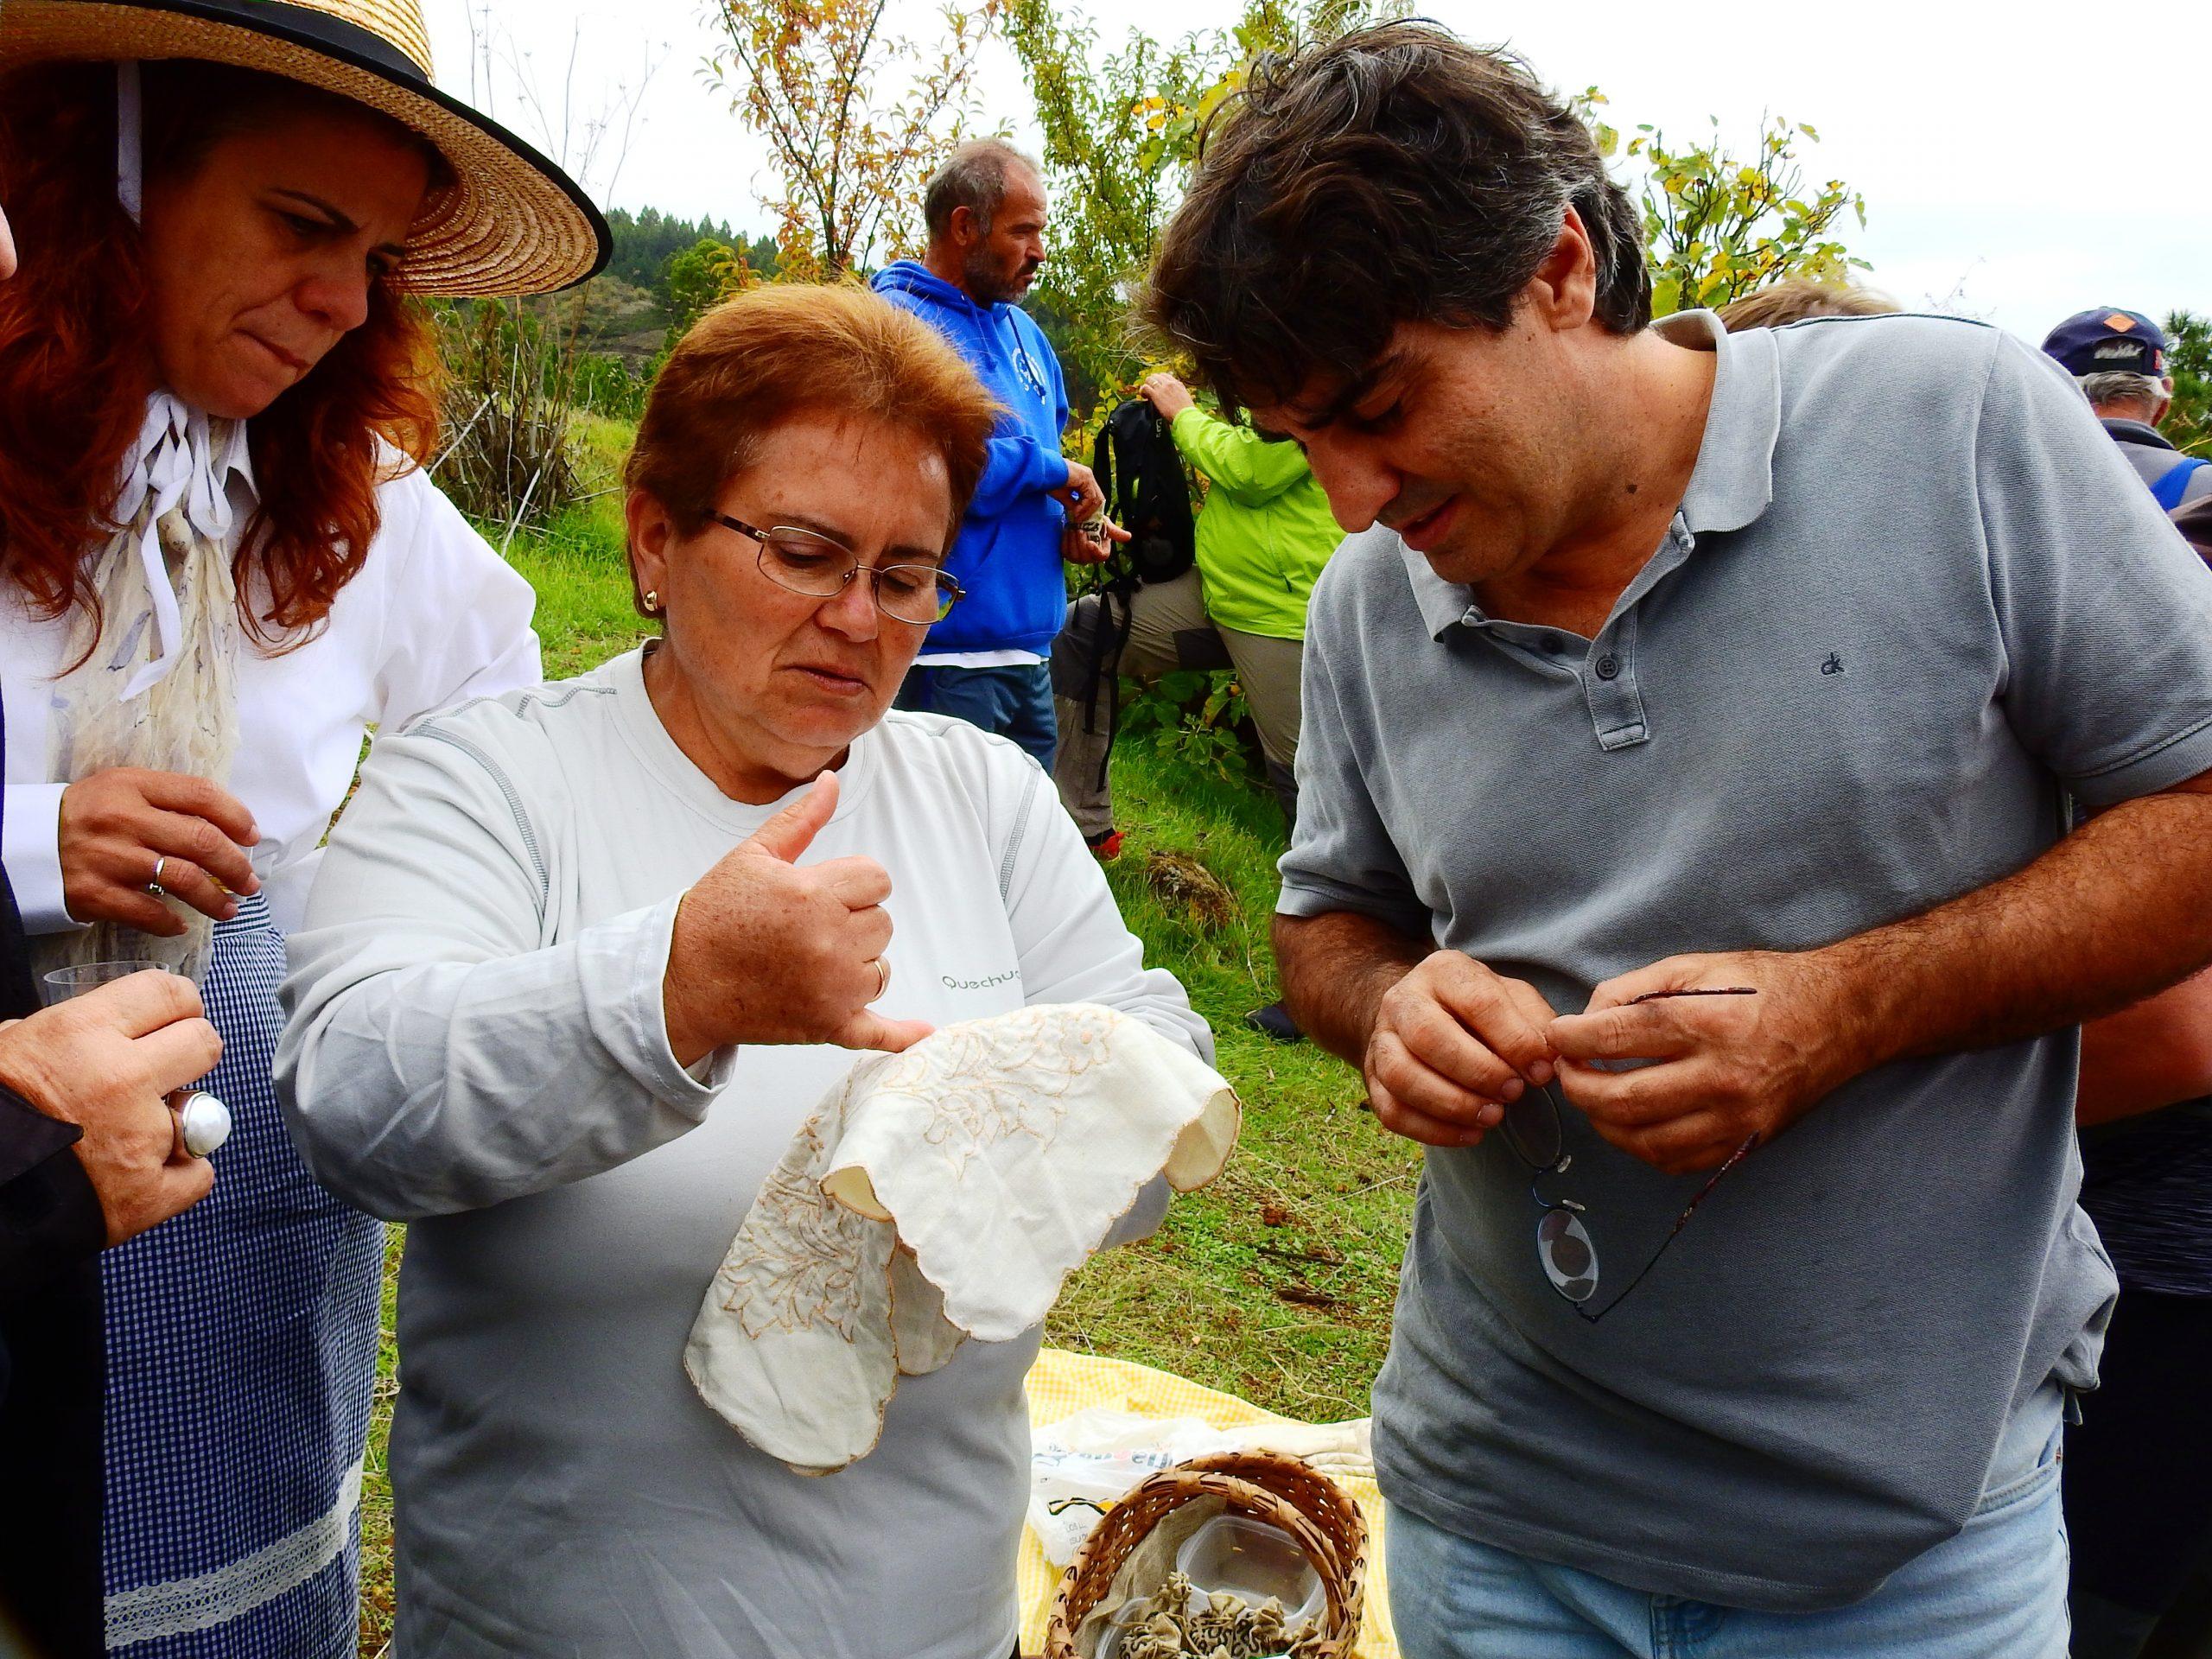 Foto nº5. Solveida mostrando las características del famoso bordado richi palmero. © Jaime Hernández Jiménez.